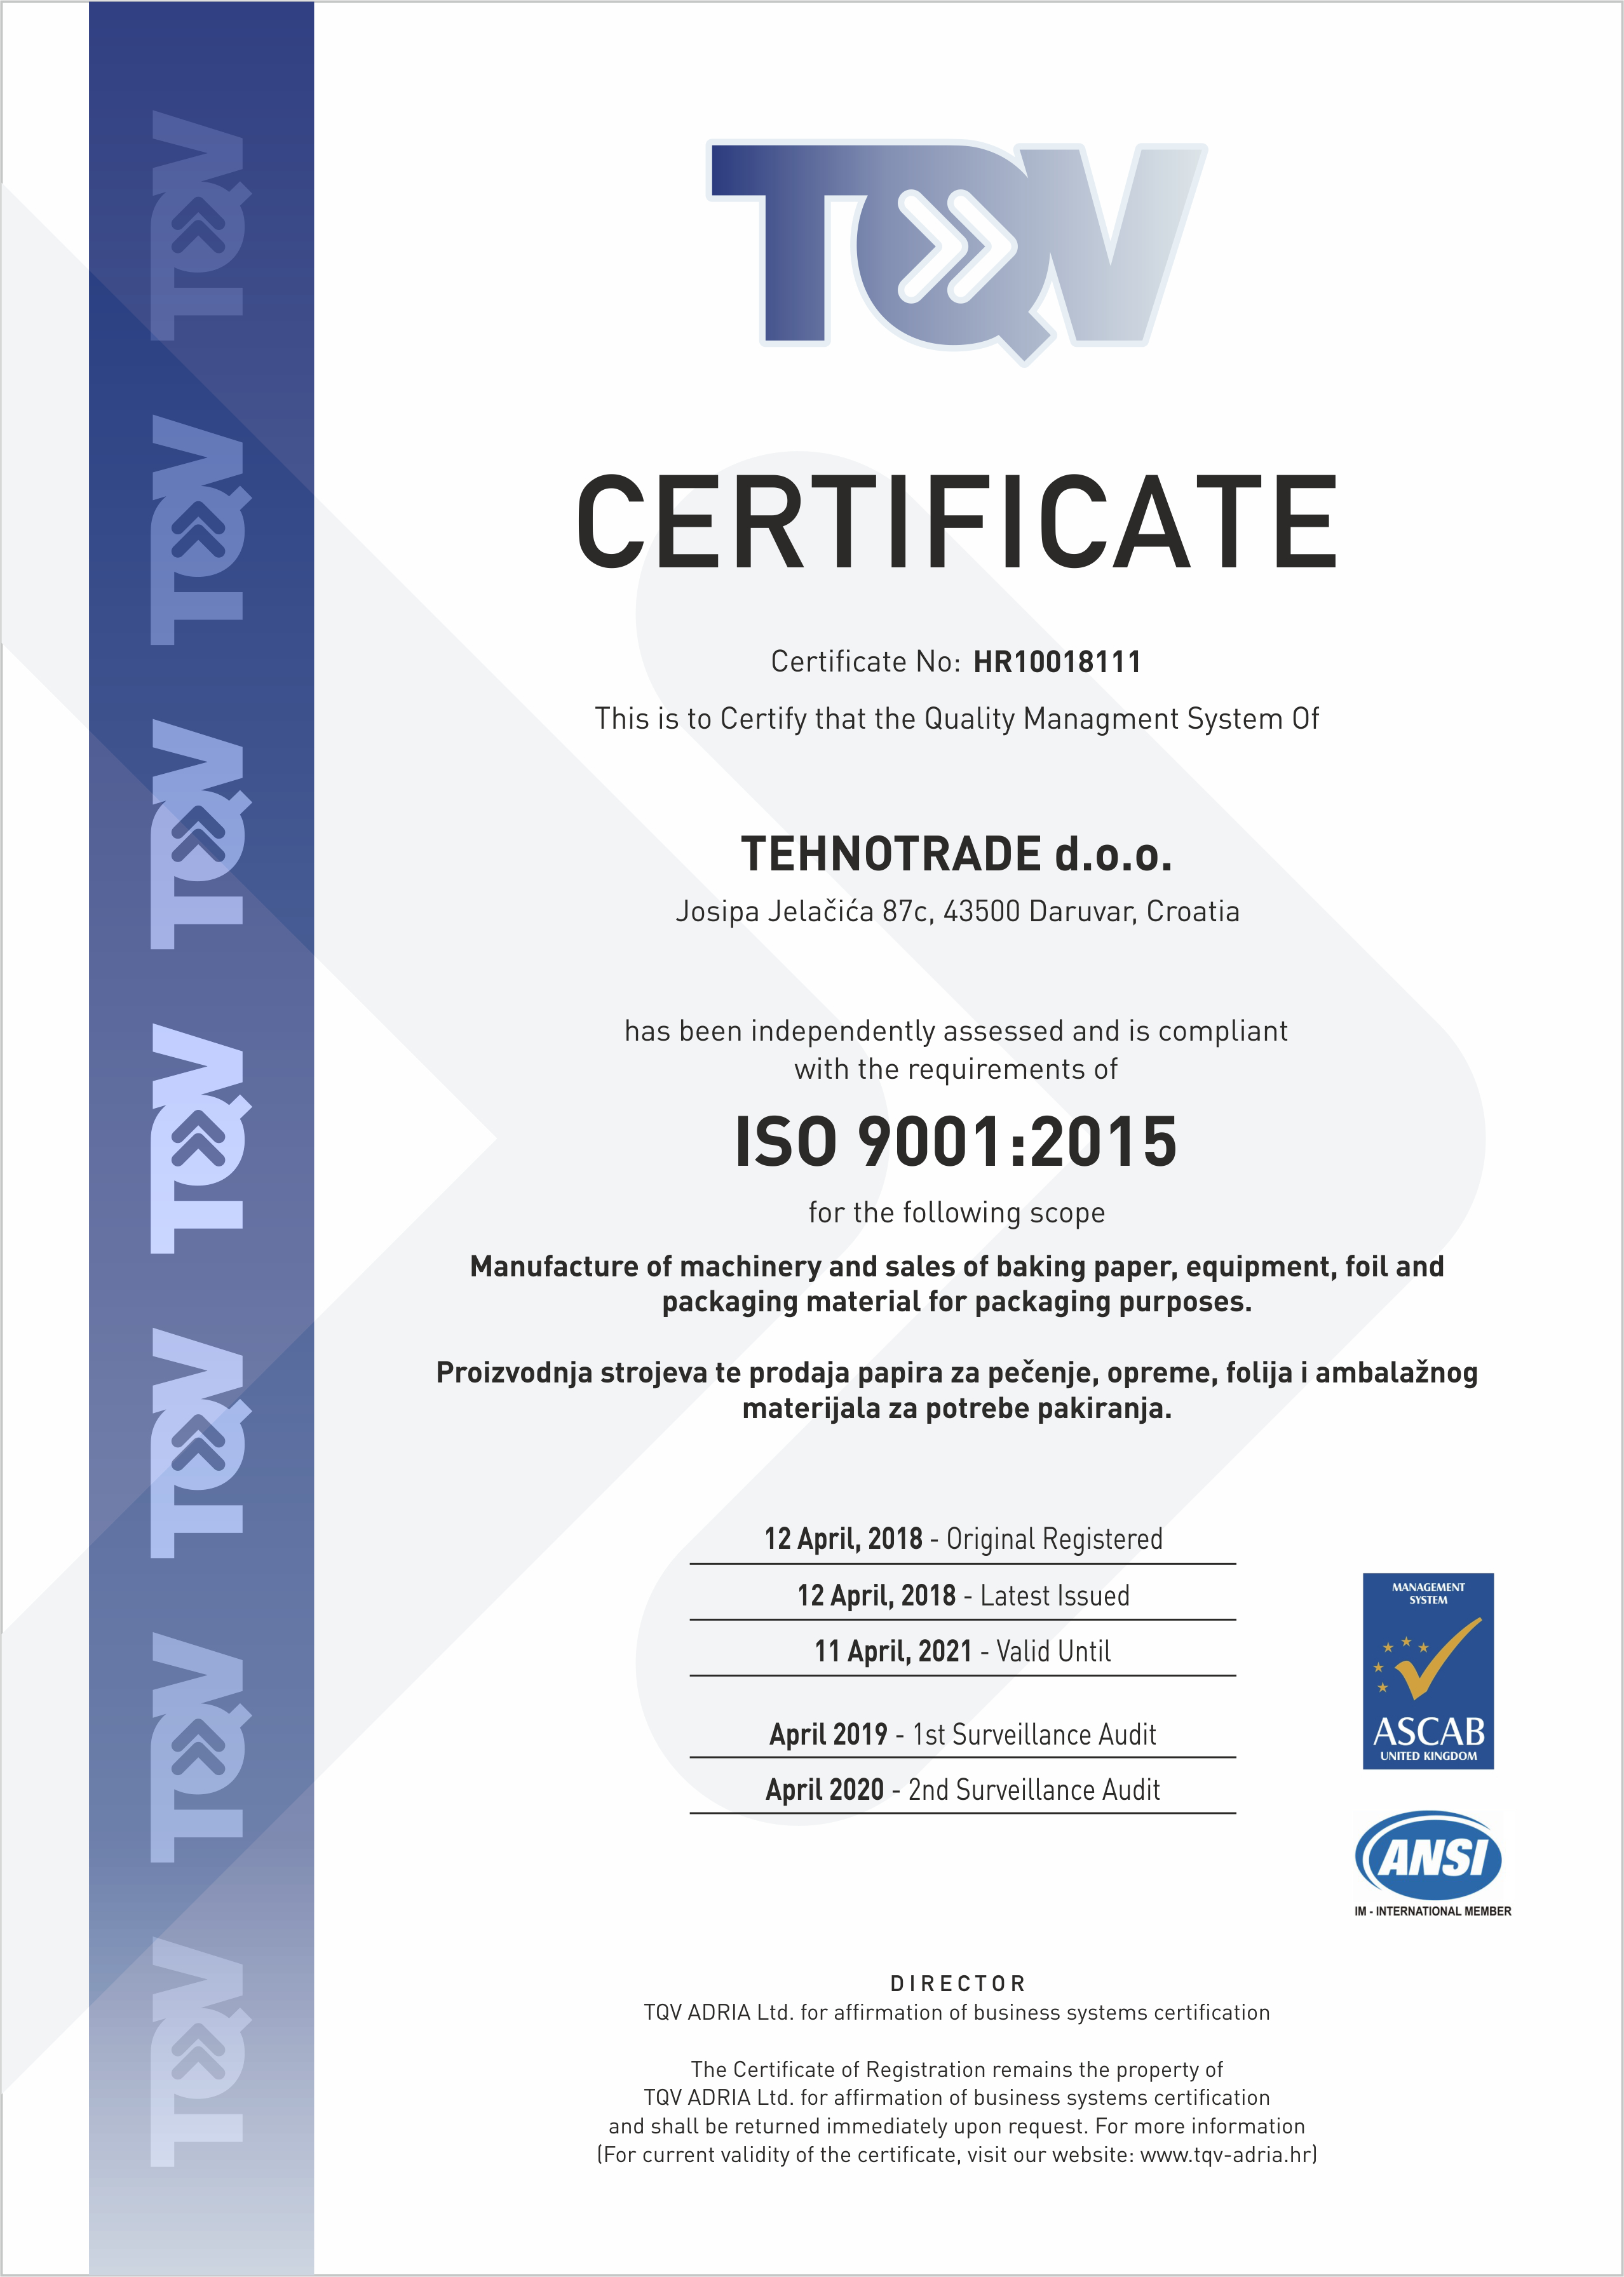 tehnotrade-certifikat